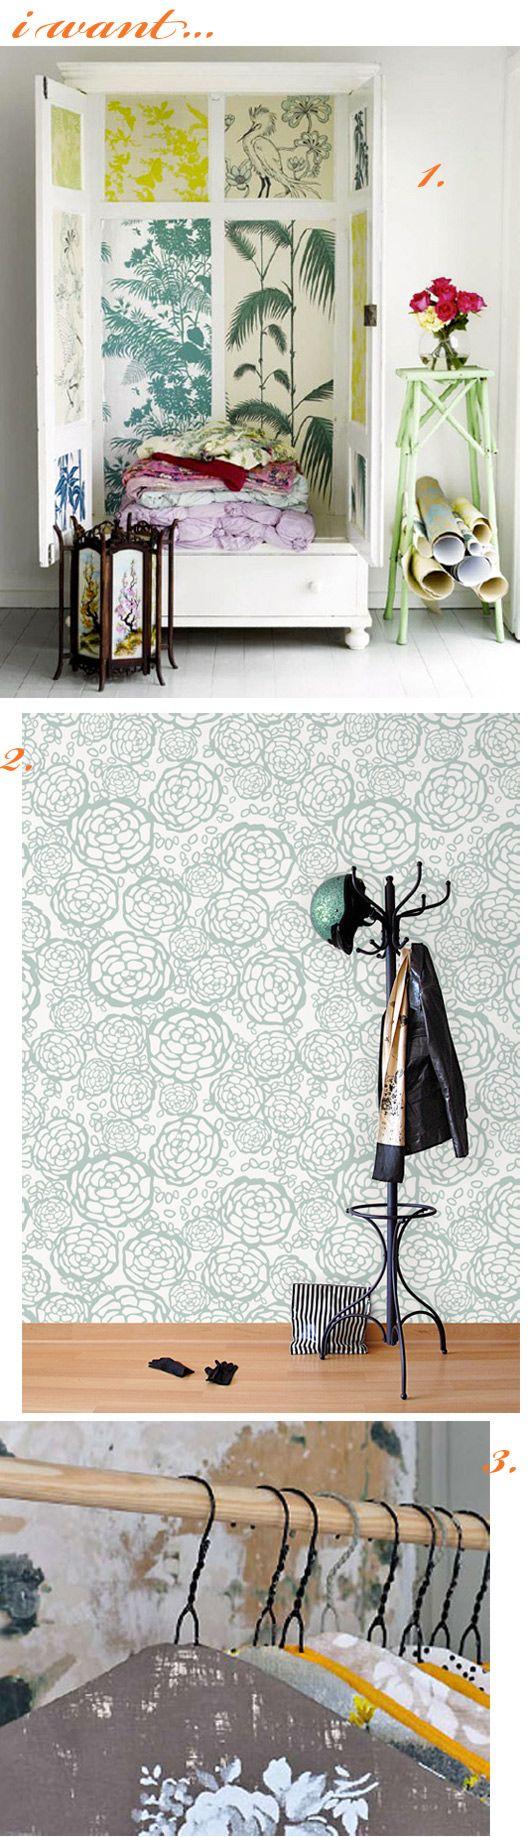 best trends images on Pinterest Bedroom ideas Child room